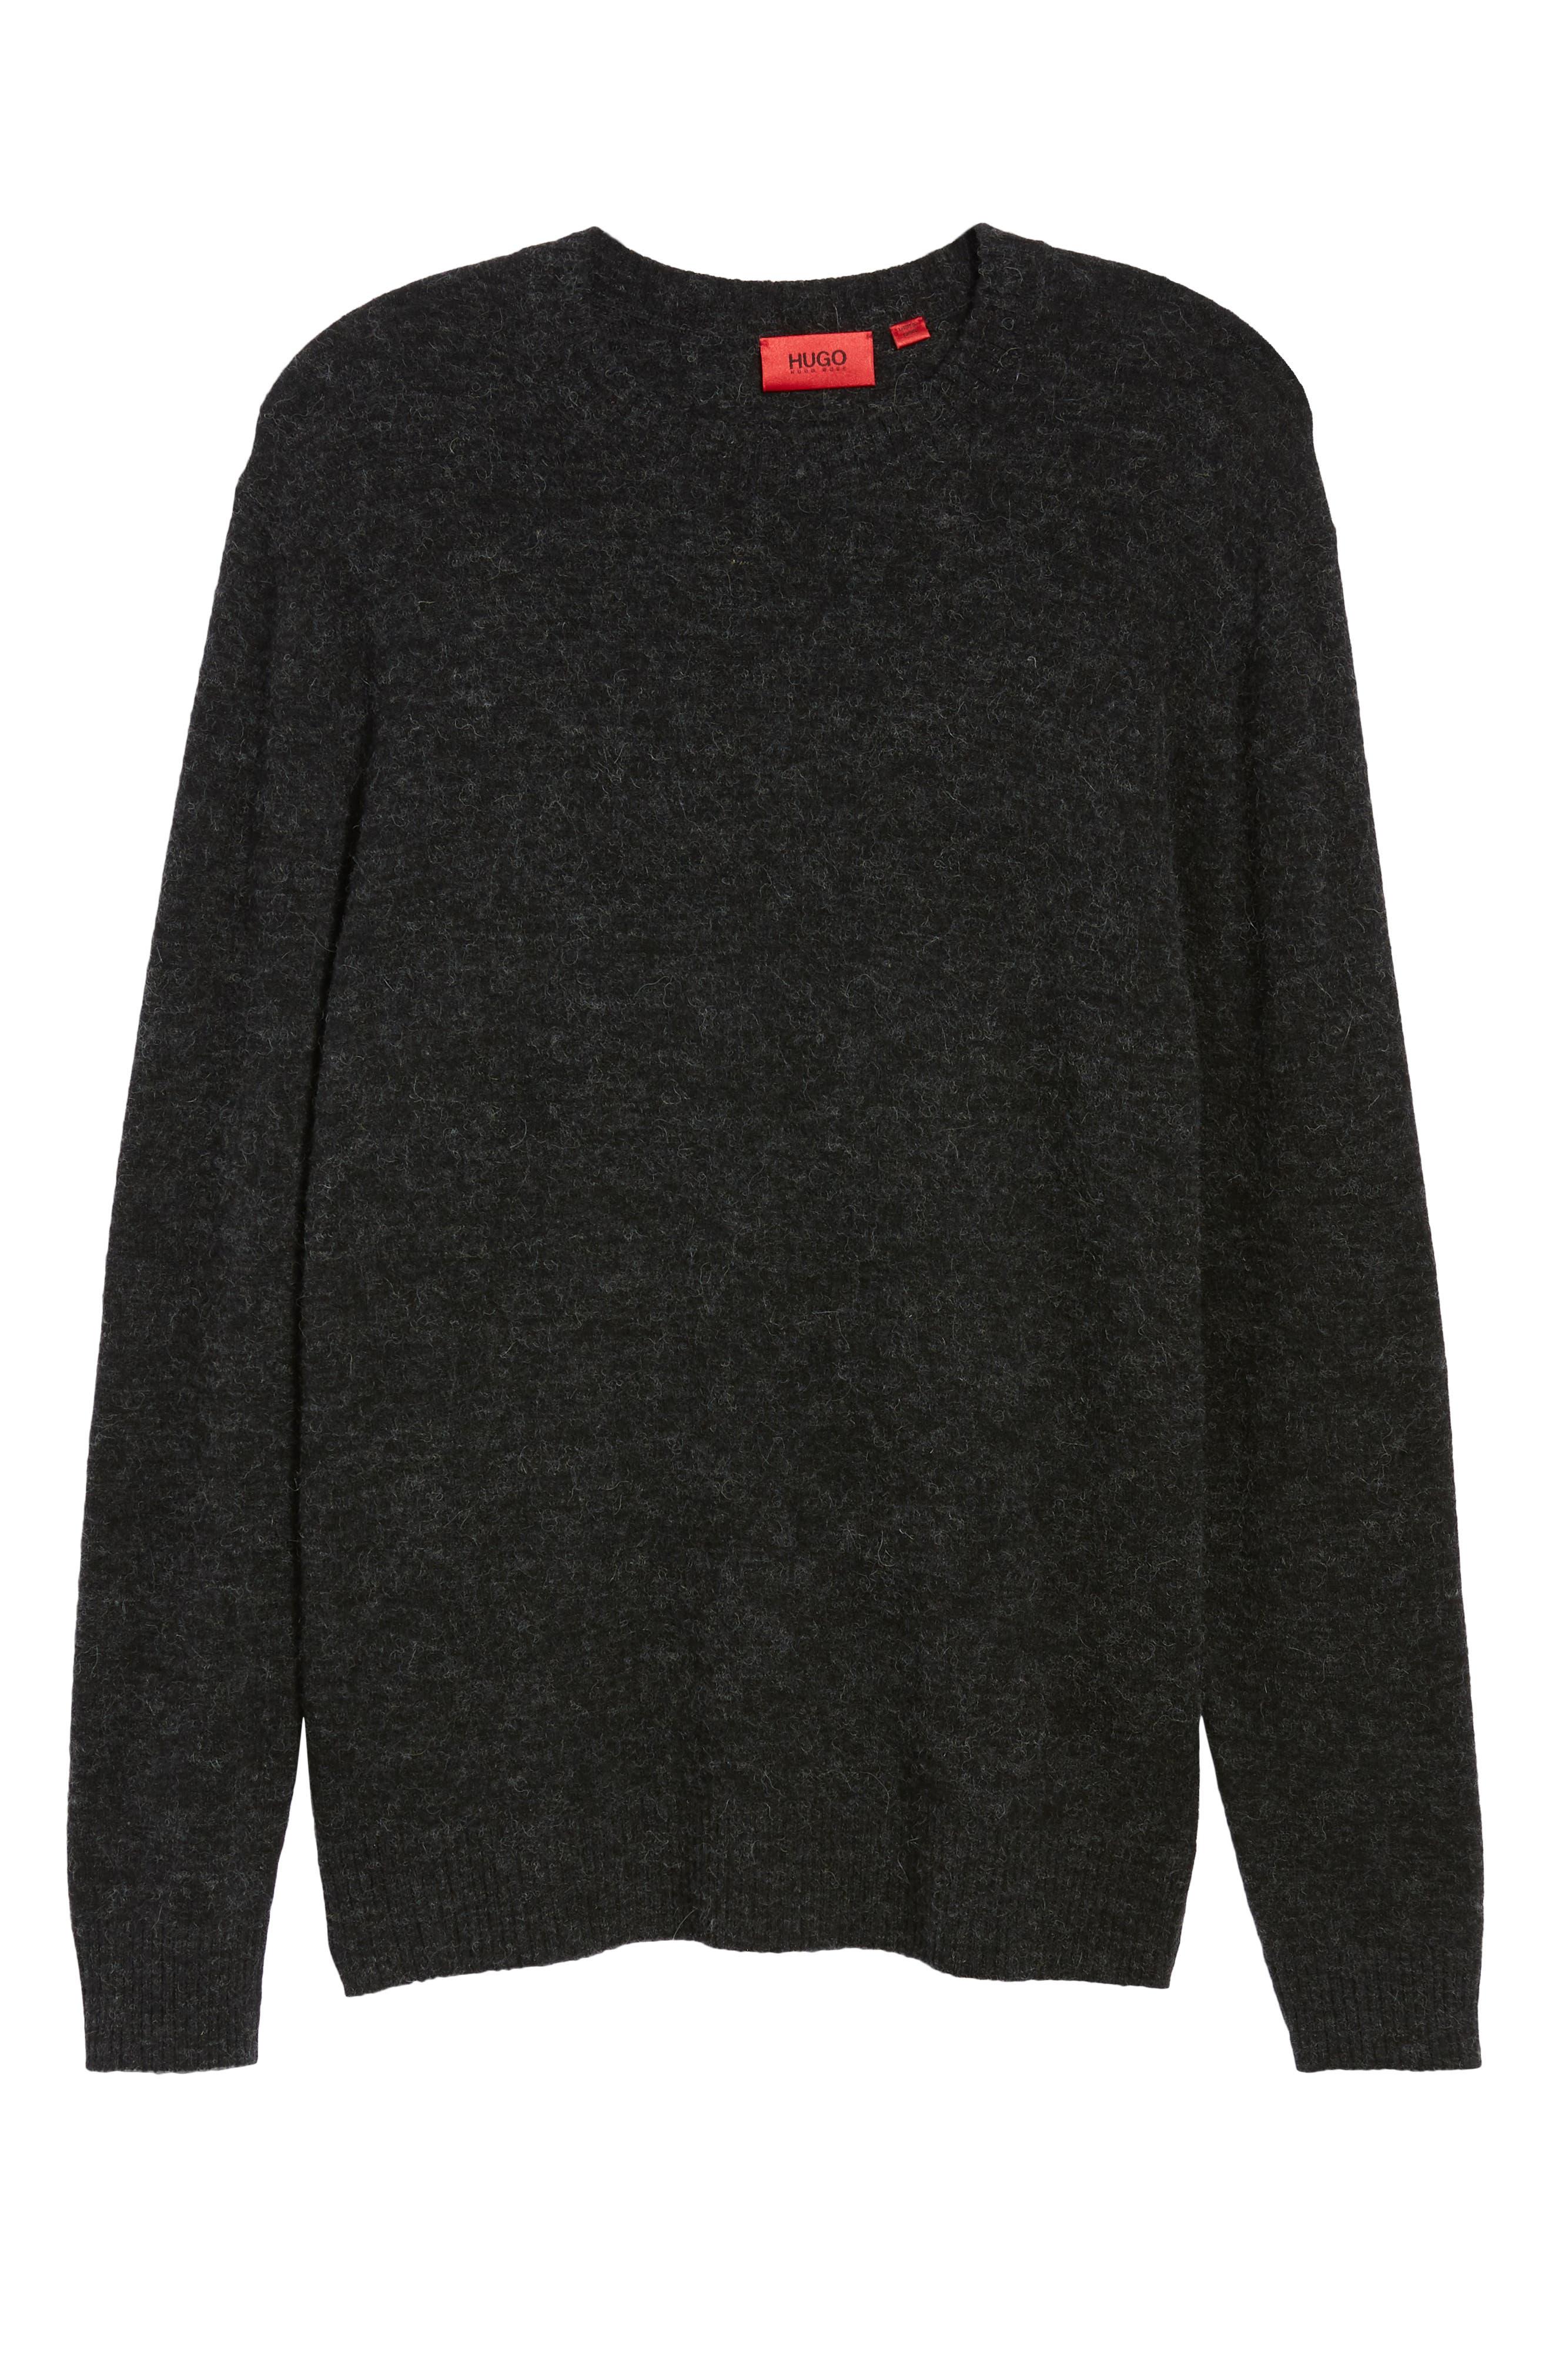 Seridon Oversize Crewneck Sweater,                             Alternate thumbnail 6, color,                             020